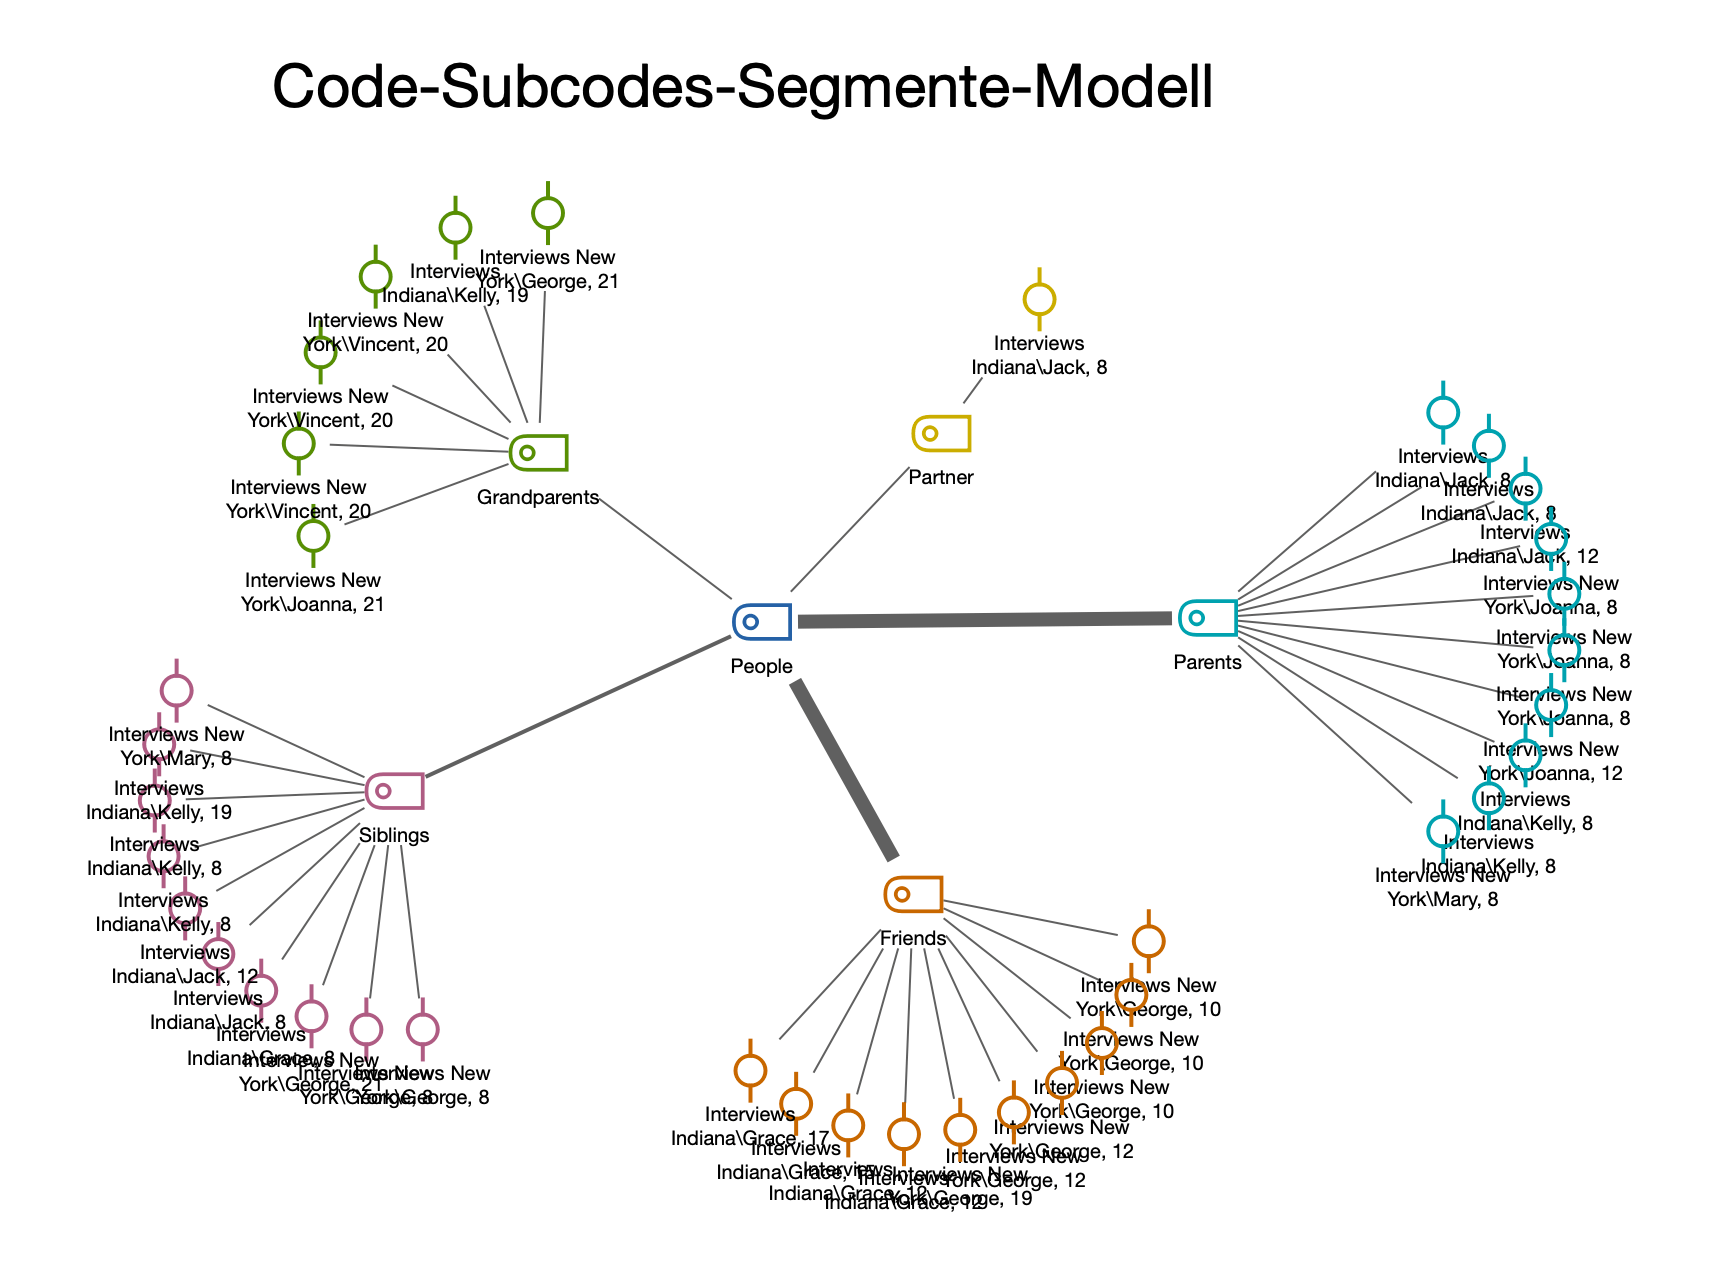 The Code-Subcodes-Segments model